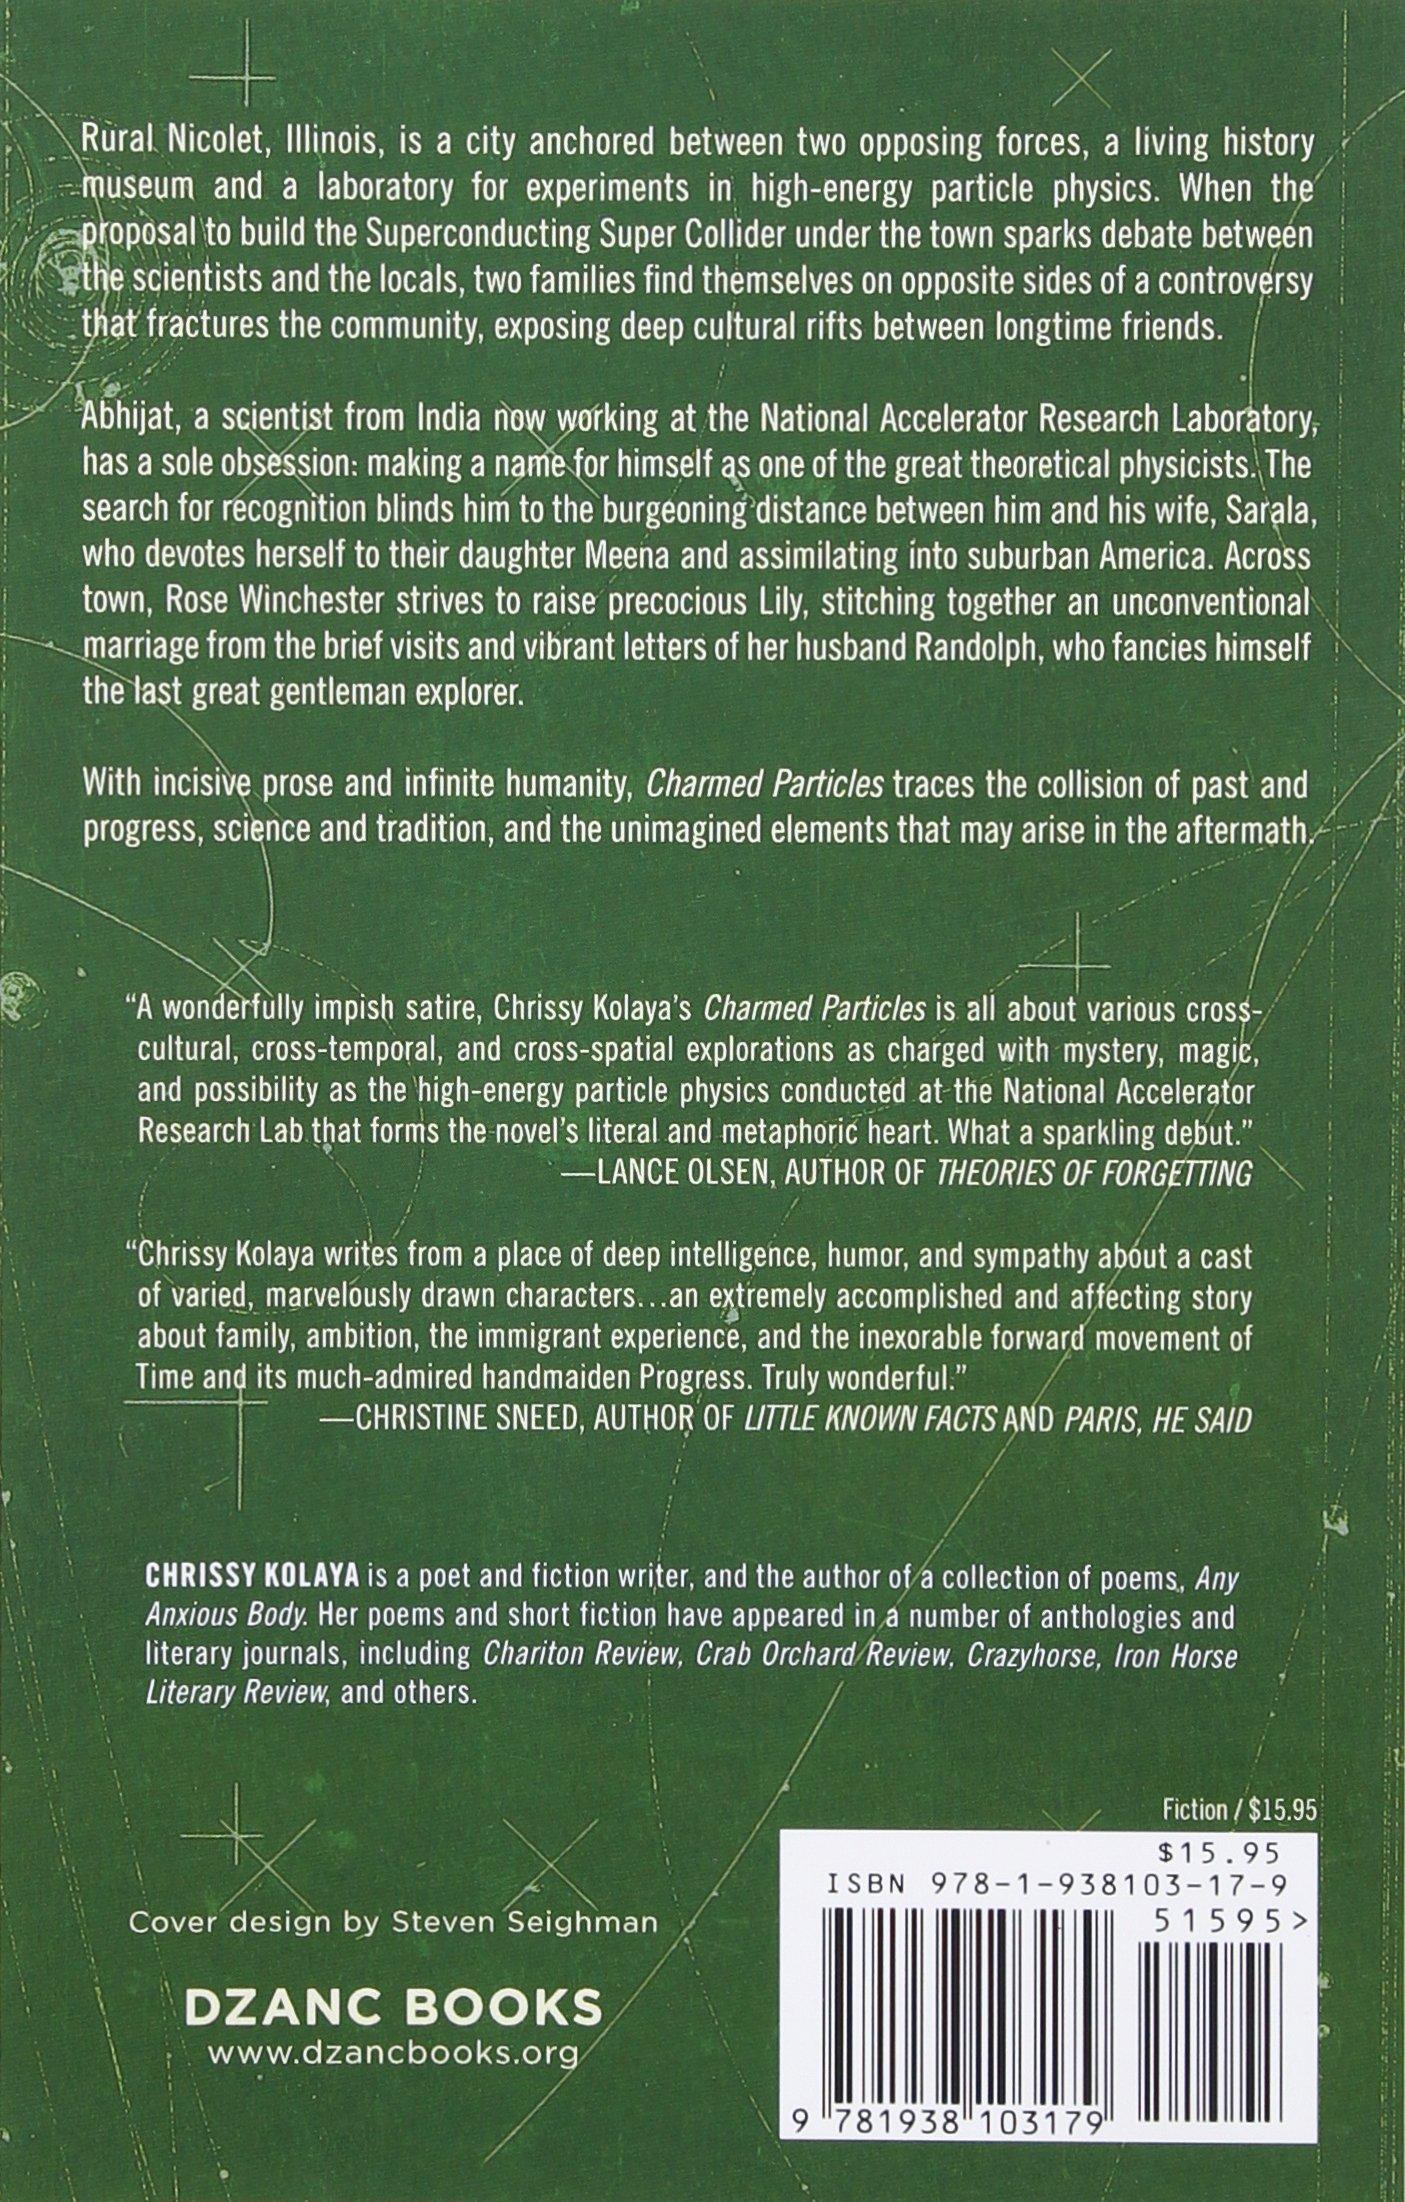 Amazon: Charmed Particles: A Novel (9781938103179): Chrissy Kolaya:  Books